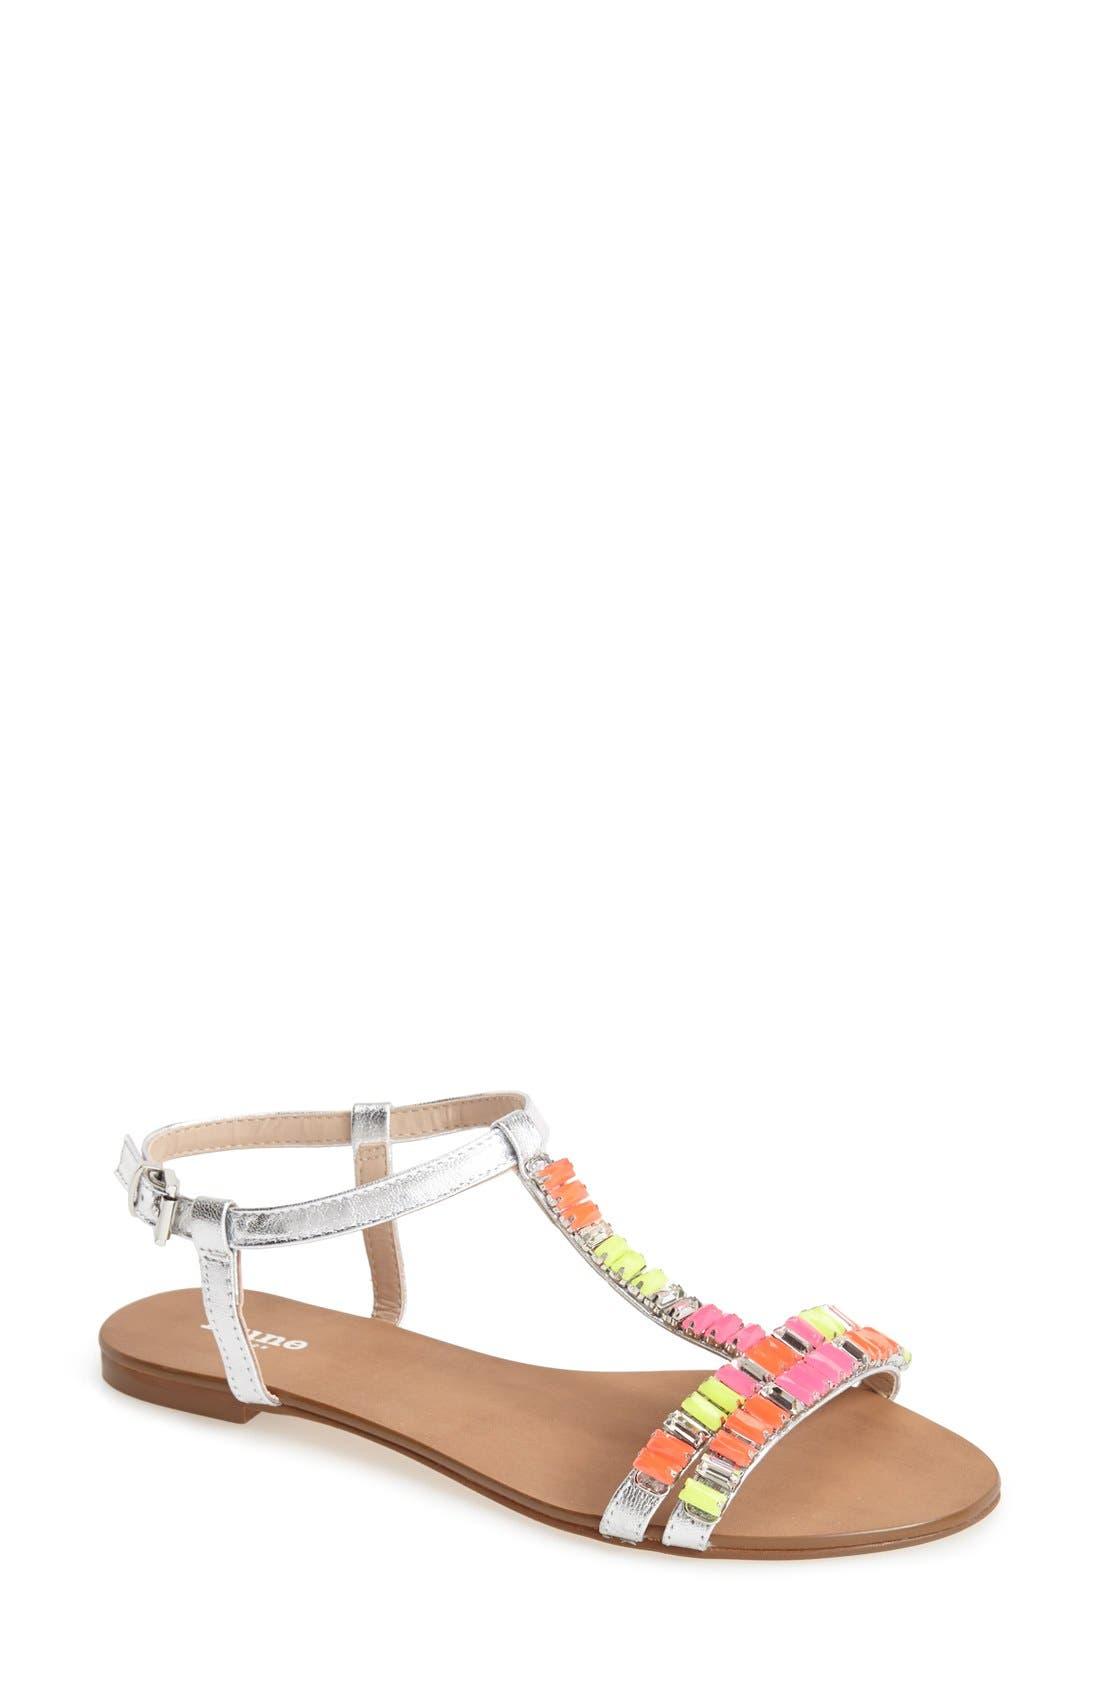 Alternate Image 1 Selected - Dune London 'Nimbo' Beaded T-Strap Flat Sandal (Women)